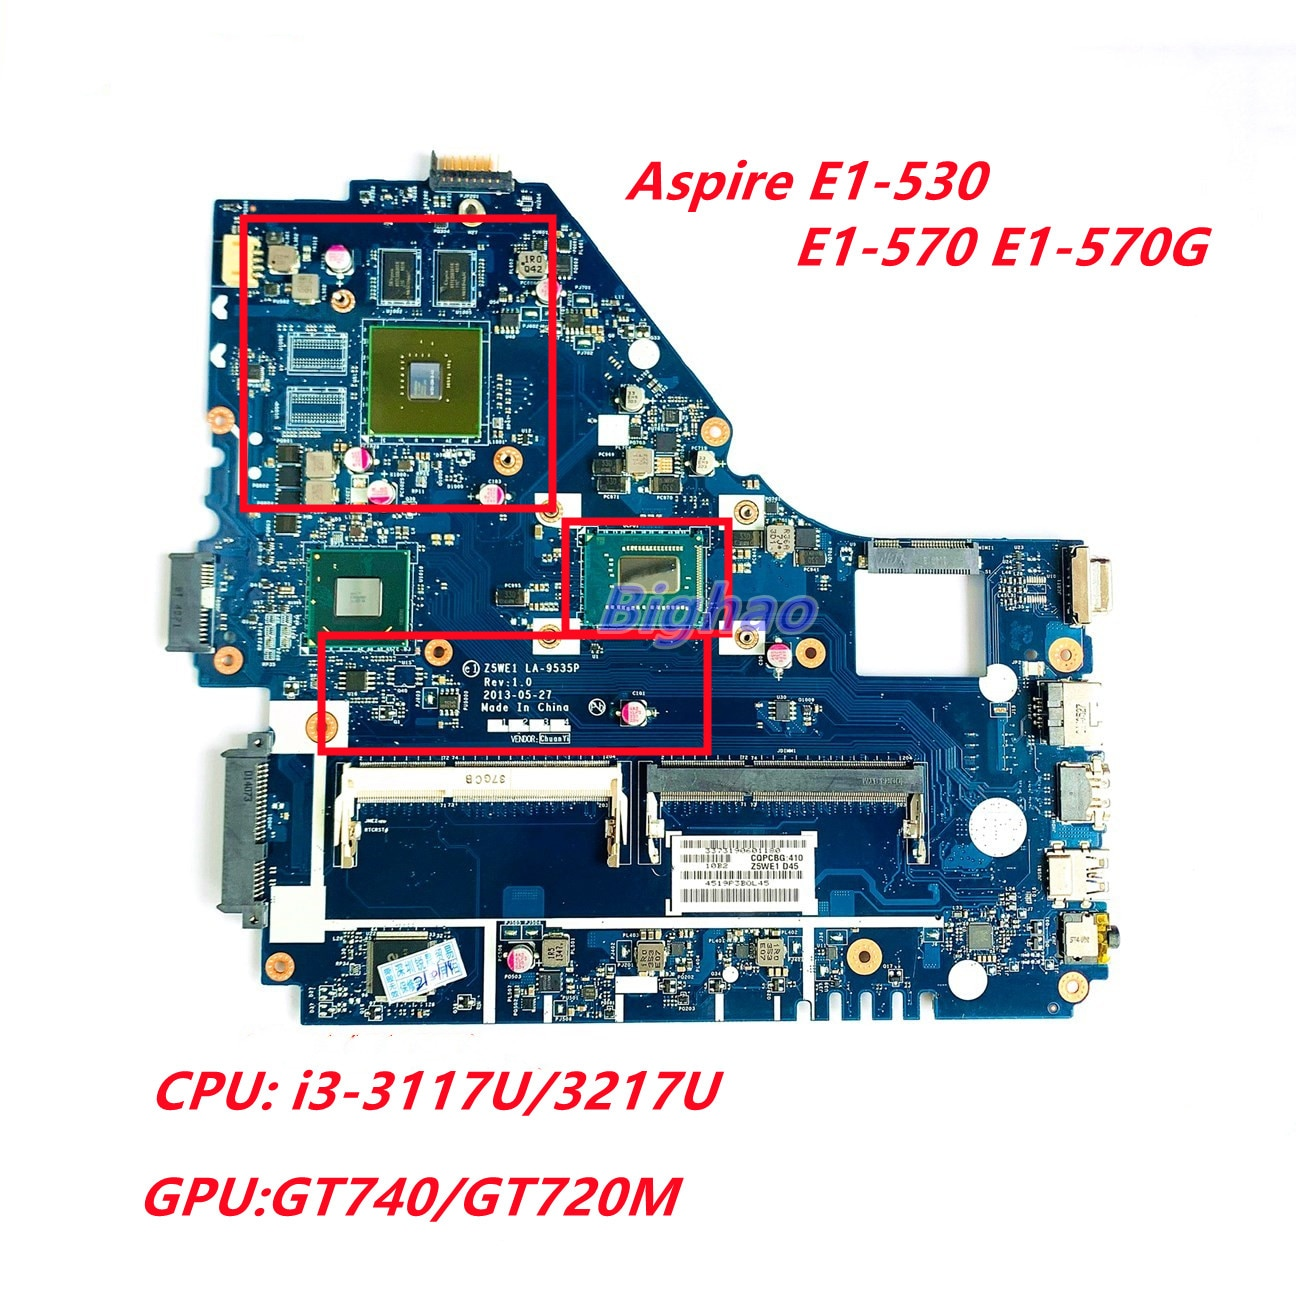 Z5WE1 LA-9535P لشركة أيسر أسباير E1-530 E1-570 E1-570G اللوحة المحمول W/وحدة المعالجة المركزية i3-3117U/3217U GT740/GT720M GPU اللوحة اختبار